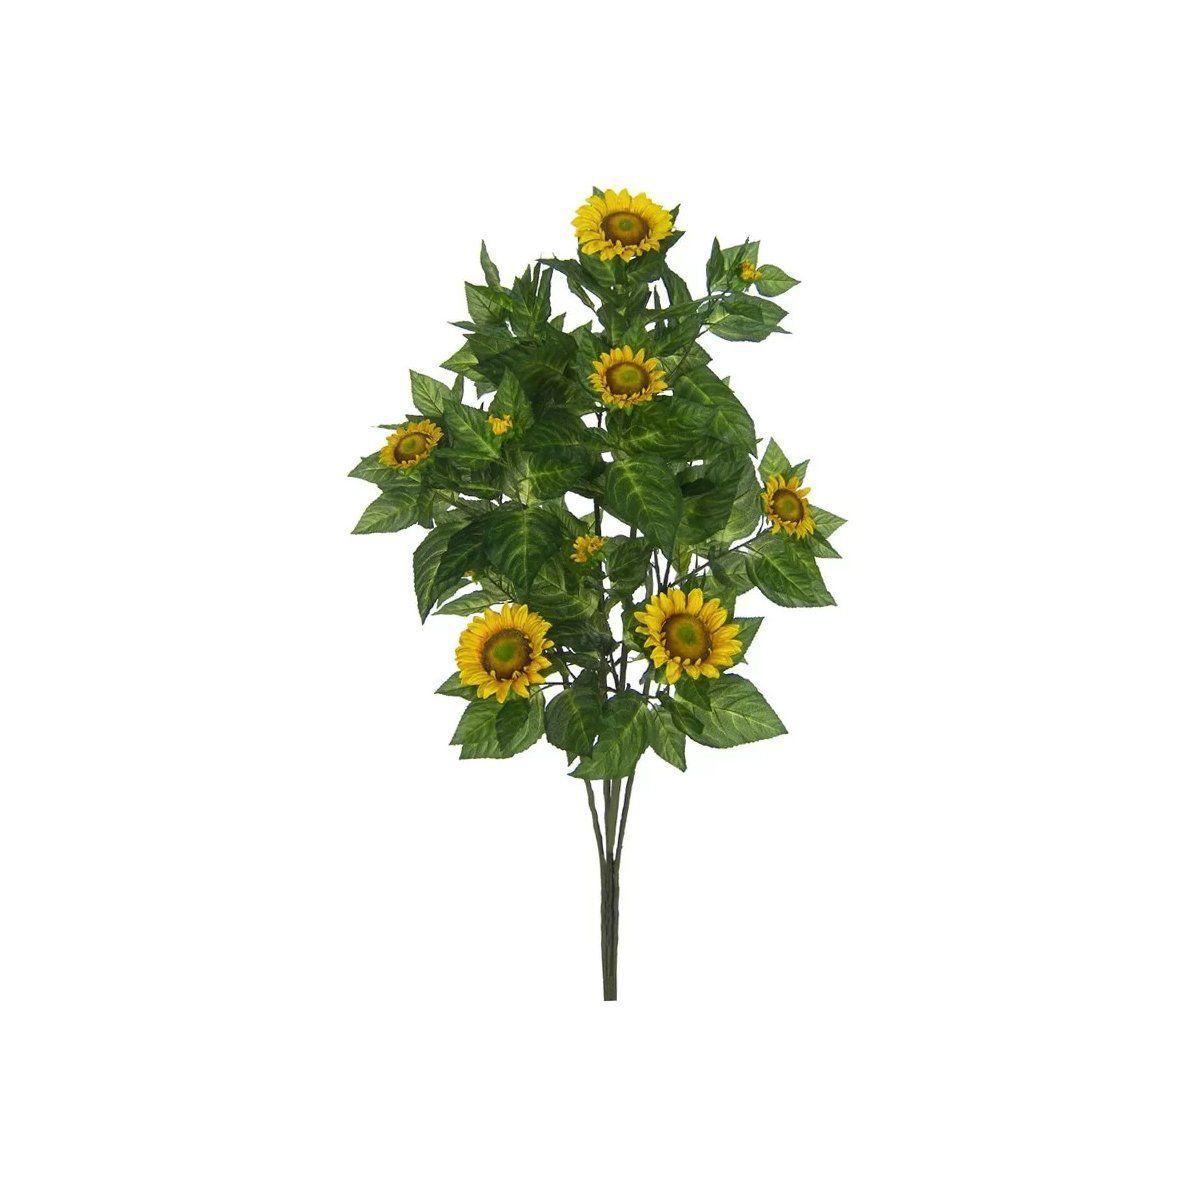 Árvore Girassol artificial Amarelo 1,35m - 00694001